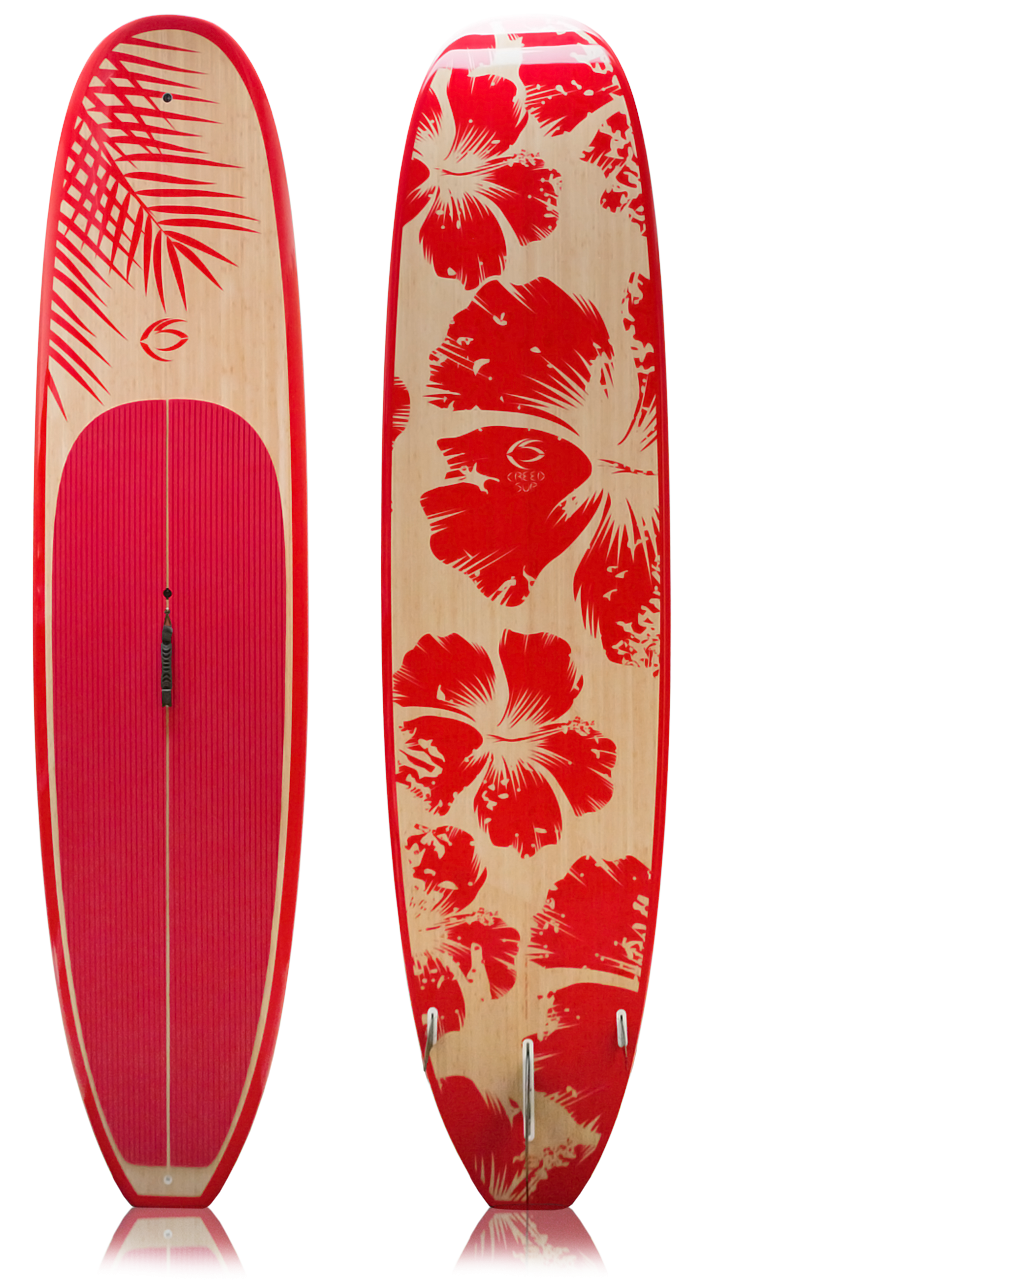 6f39c8a9b 11 foot bamboo paddle board